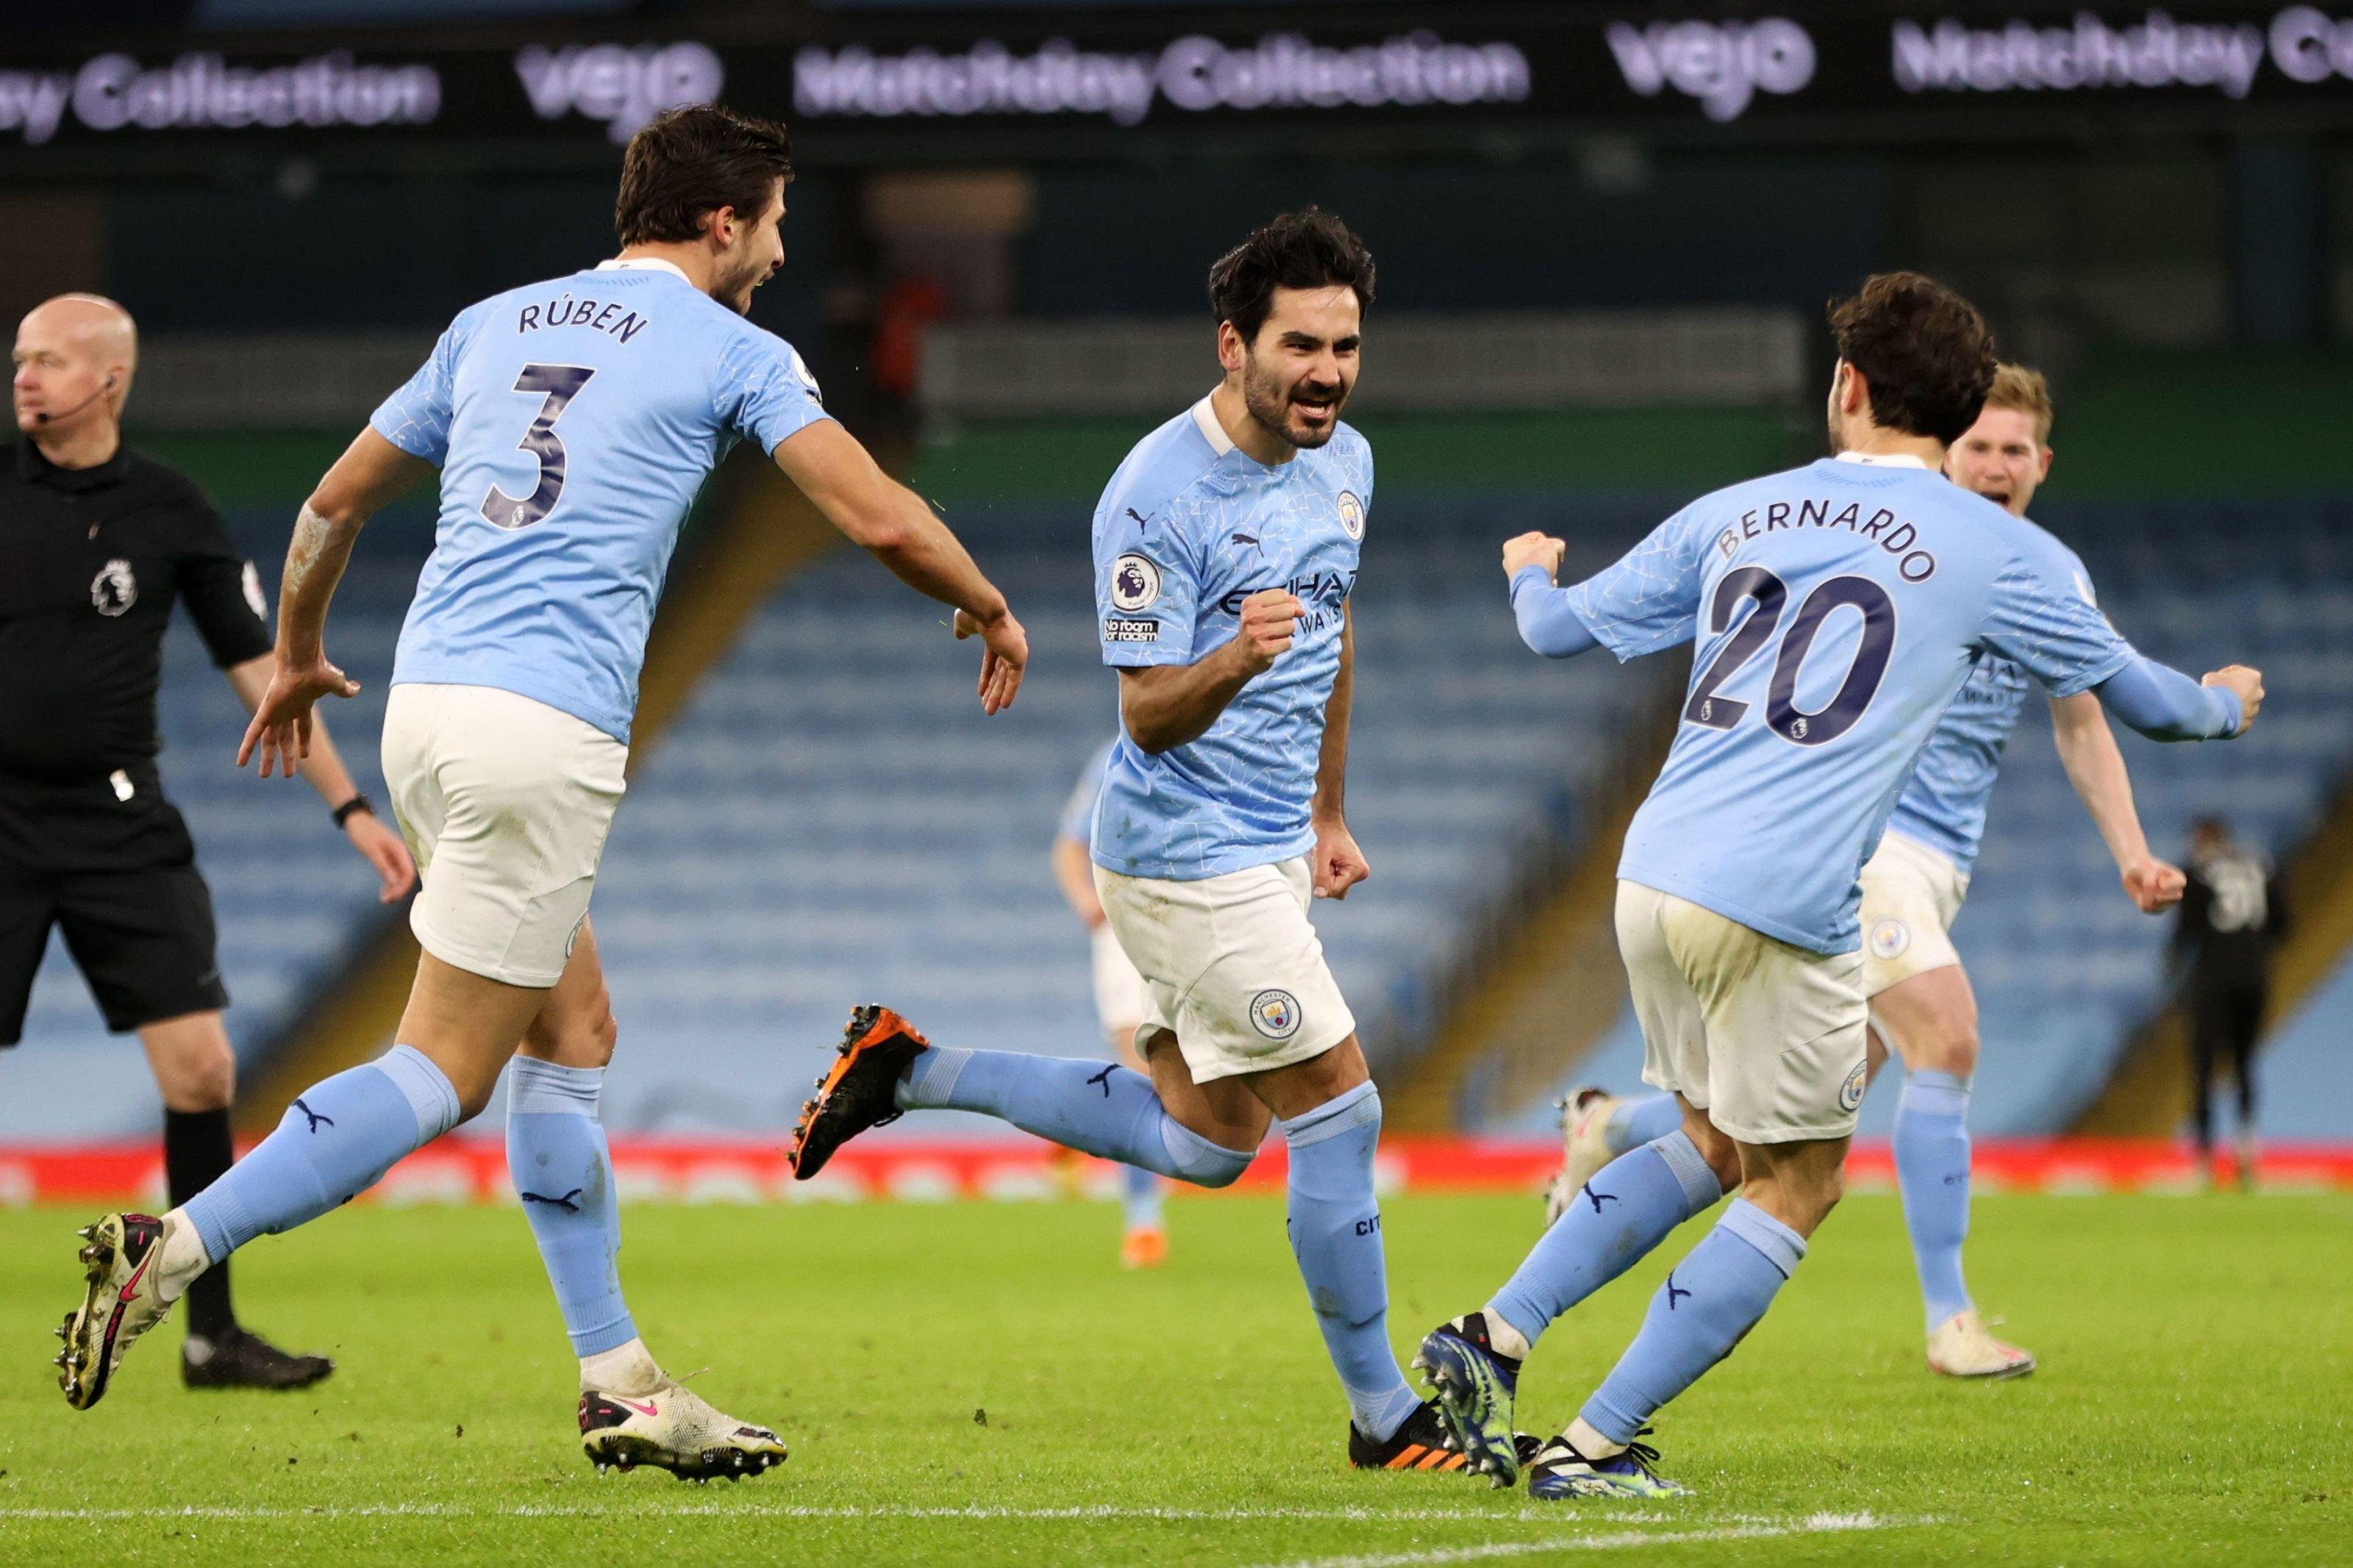 Man City season extra special says Guardiola